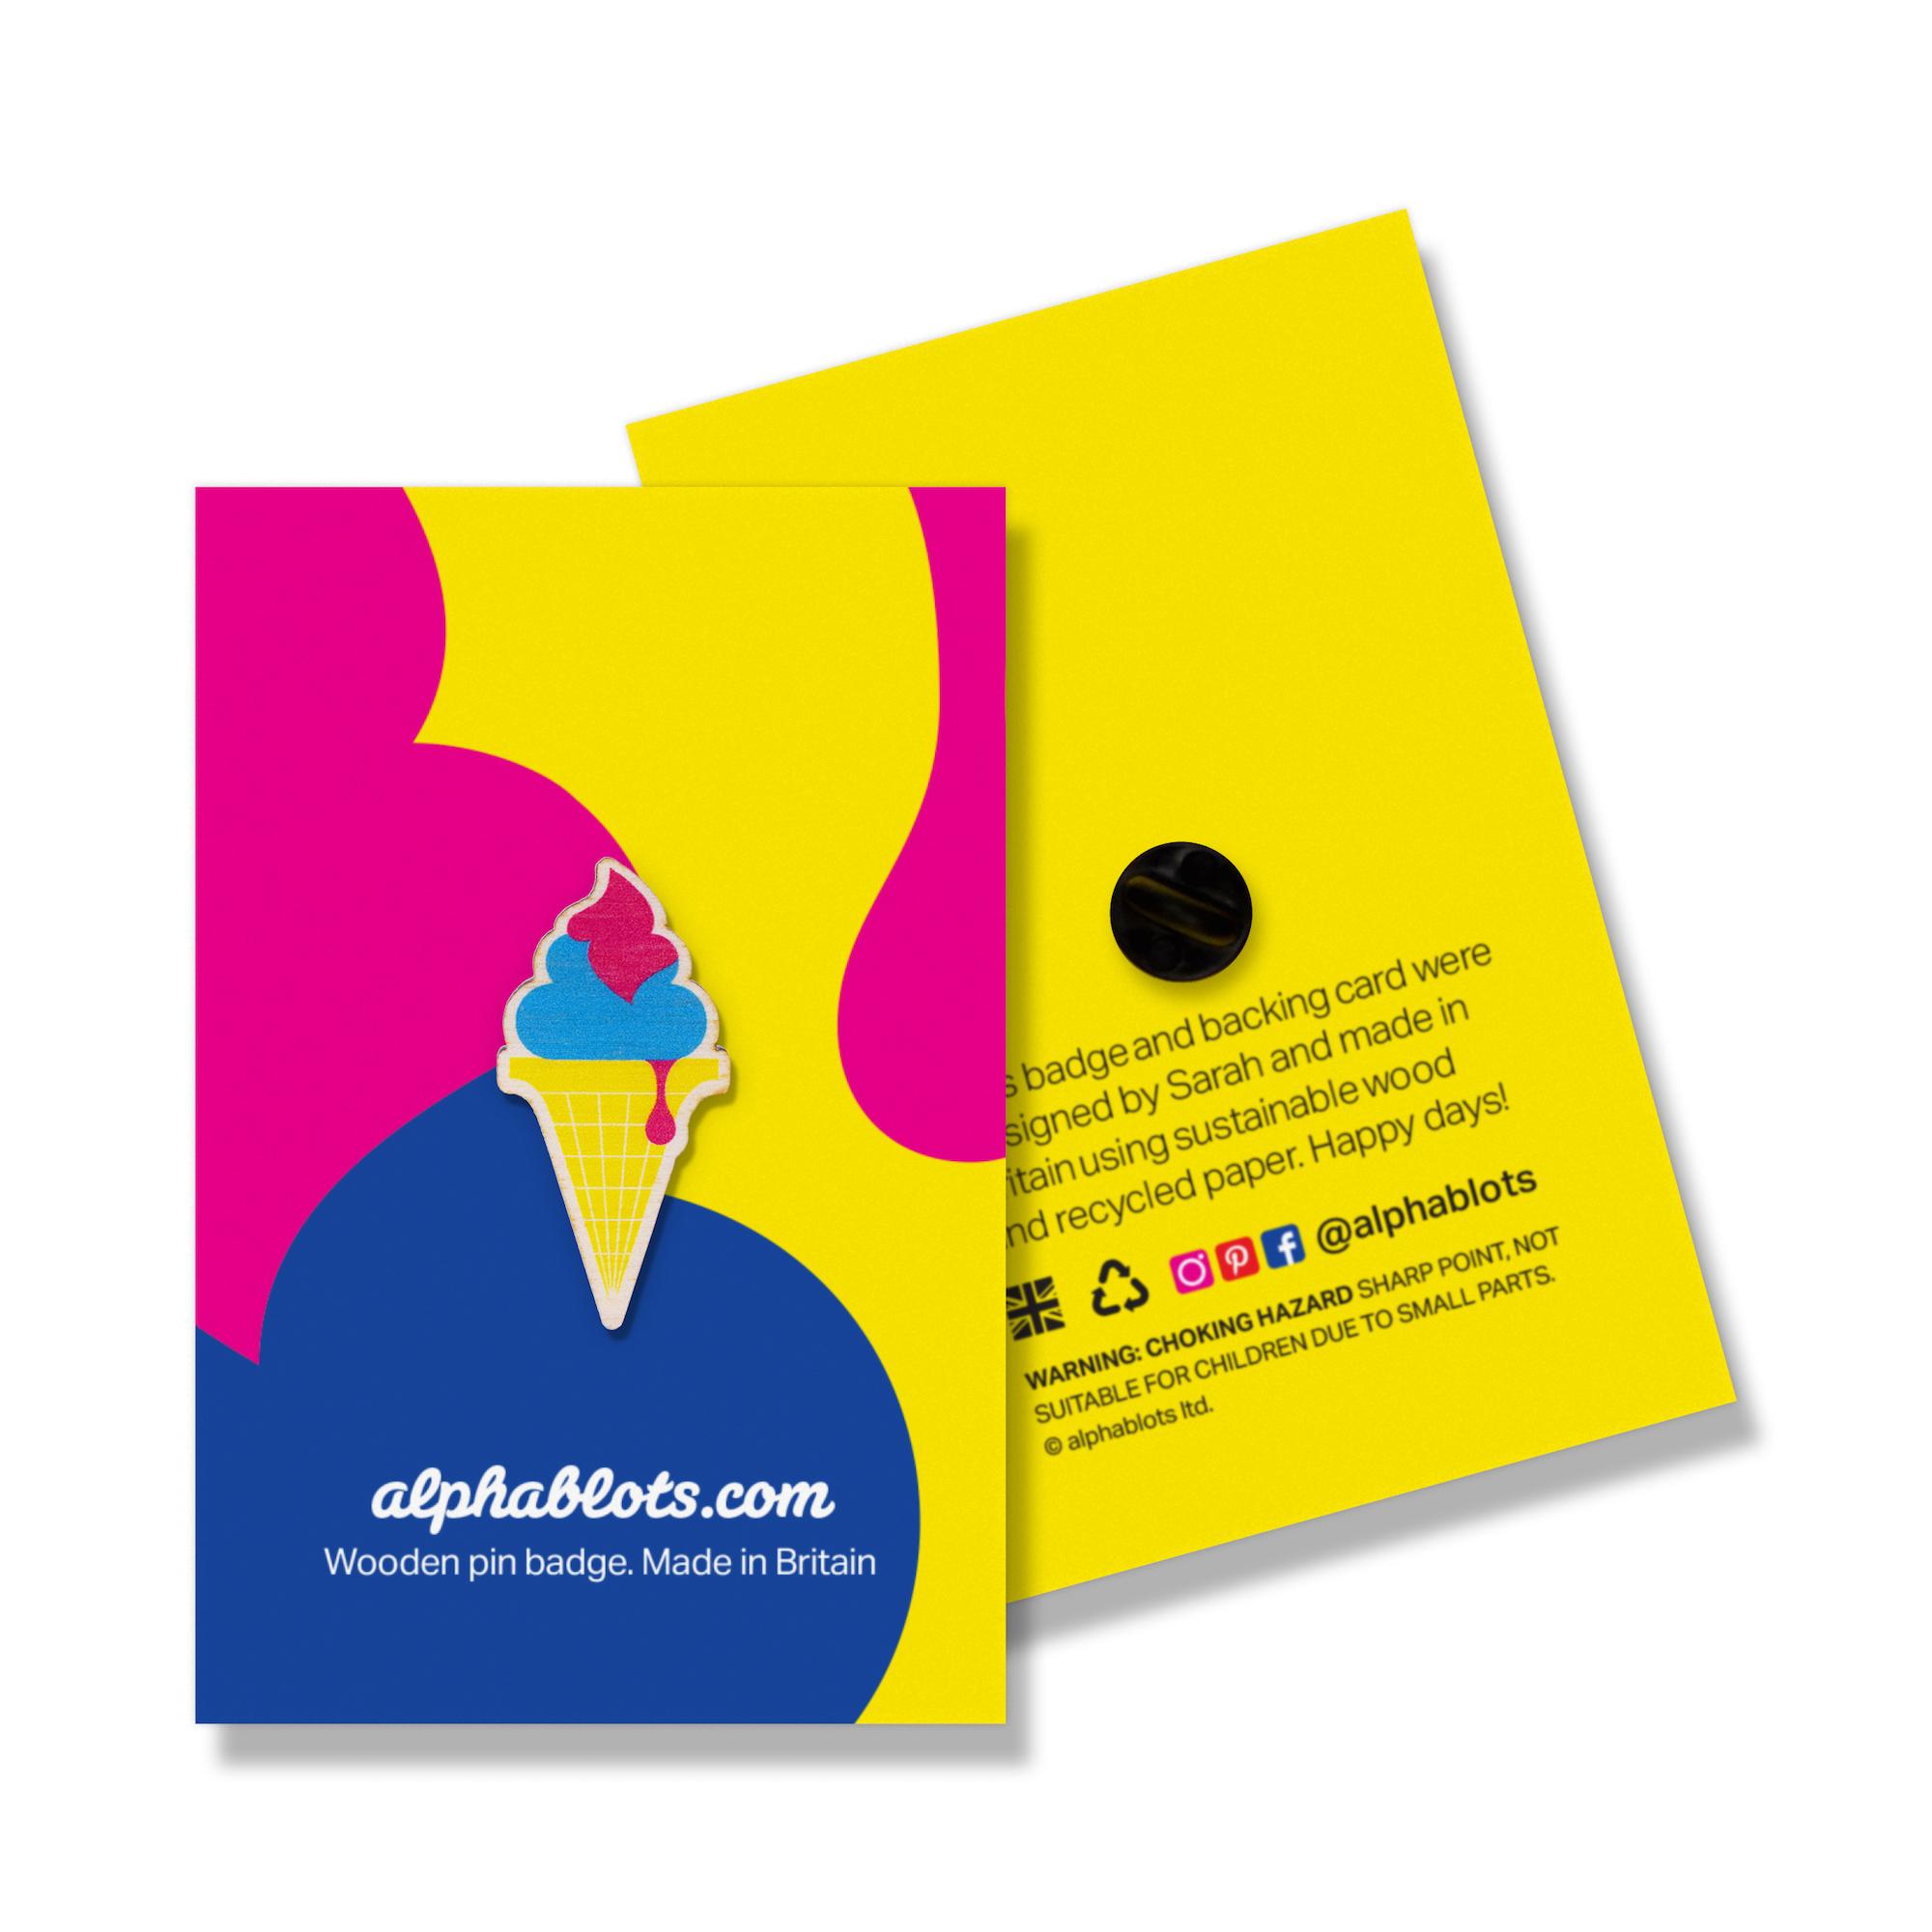 Ice cream pin badge by Alphablots